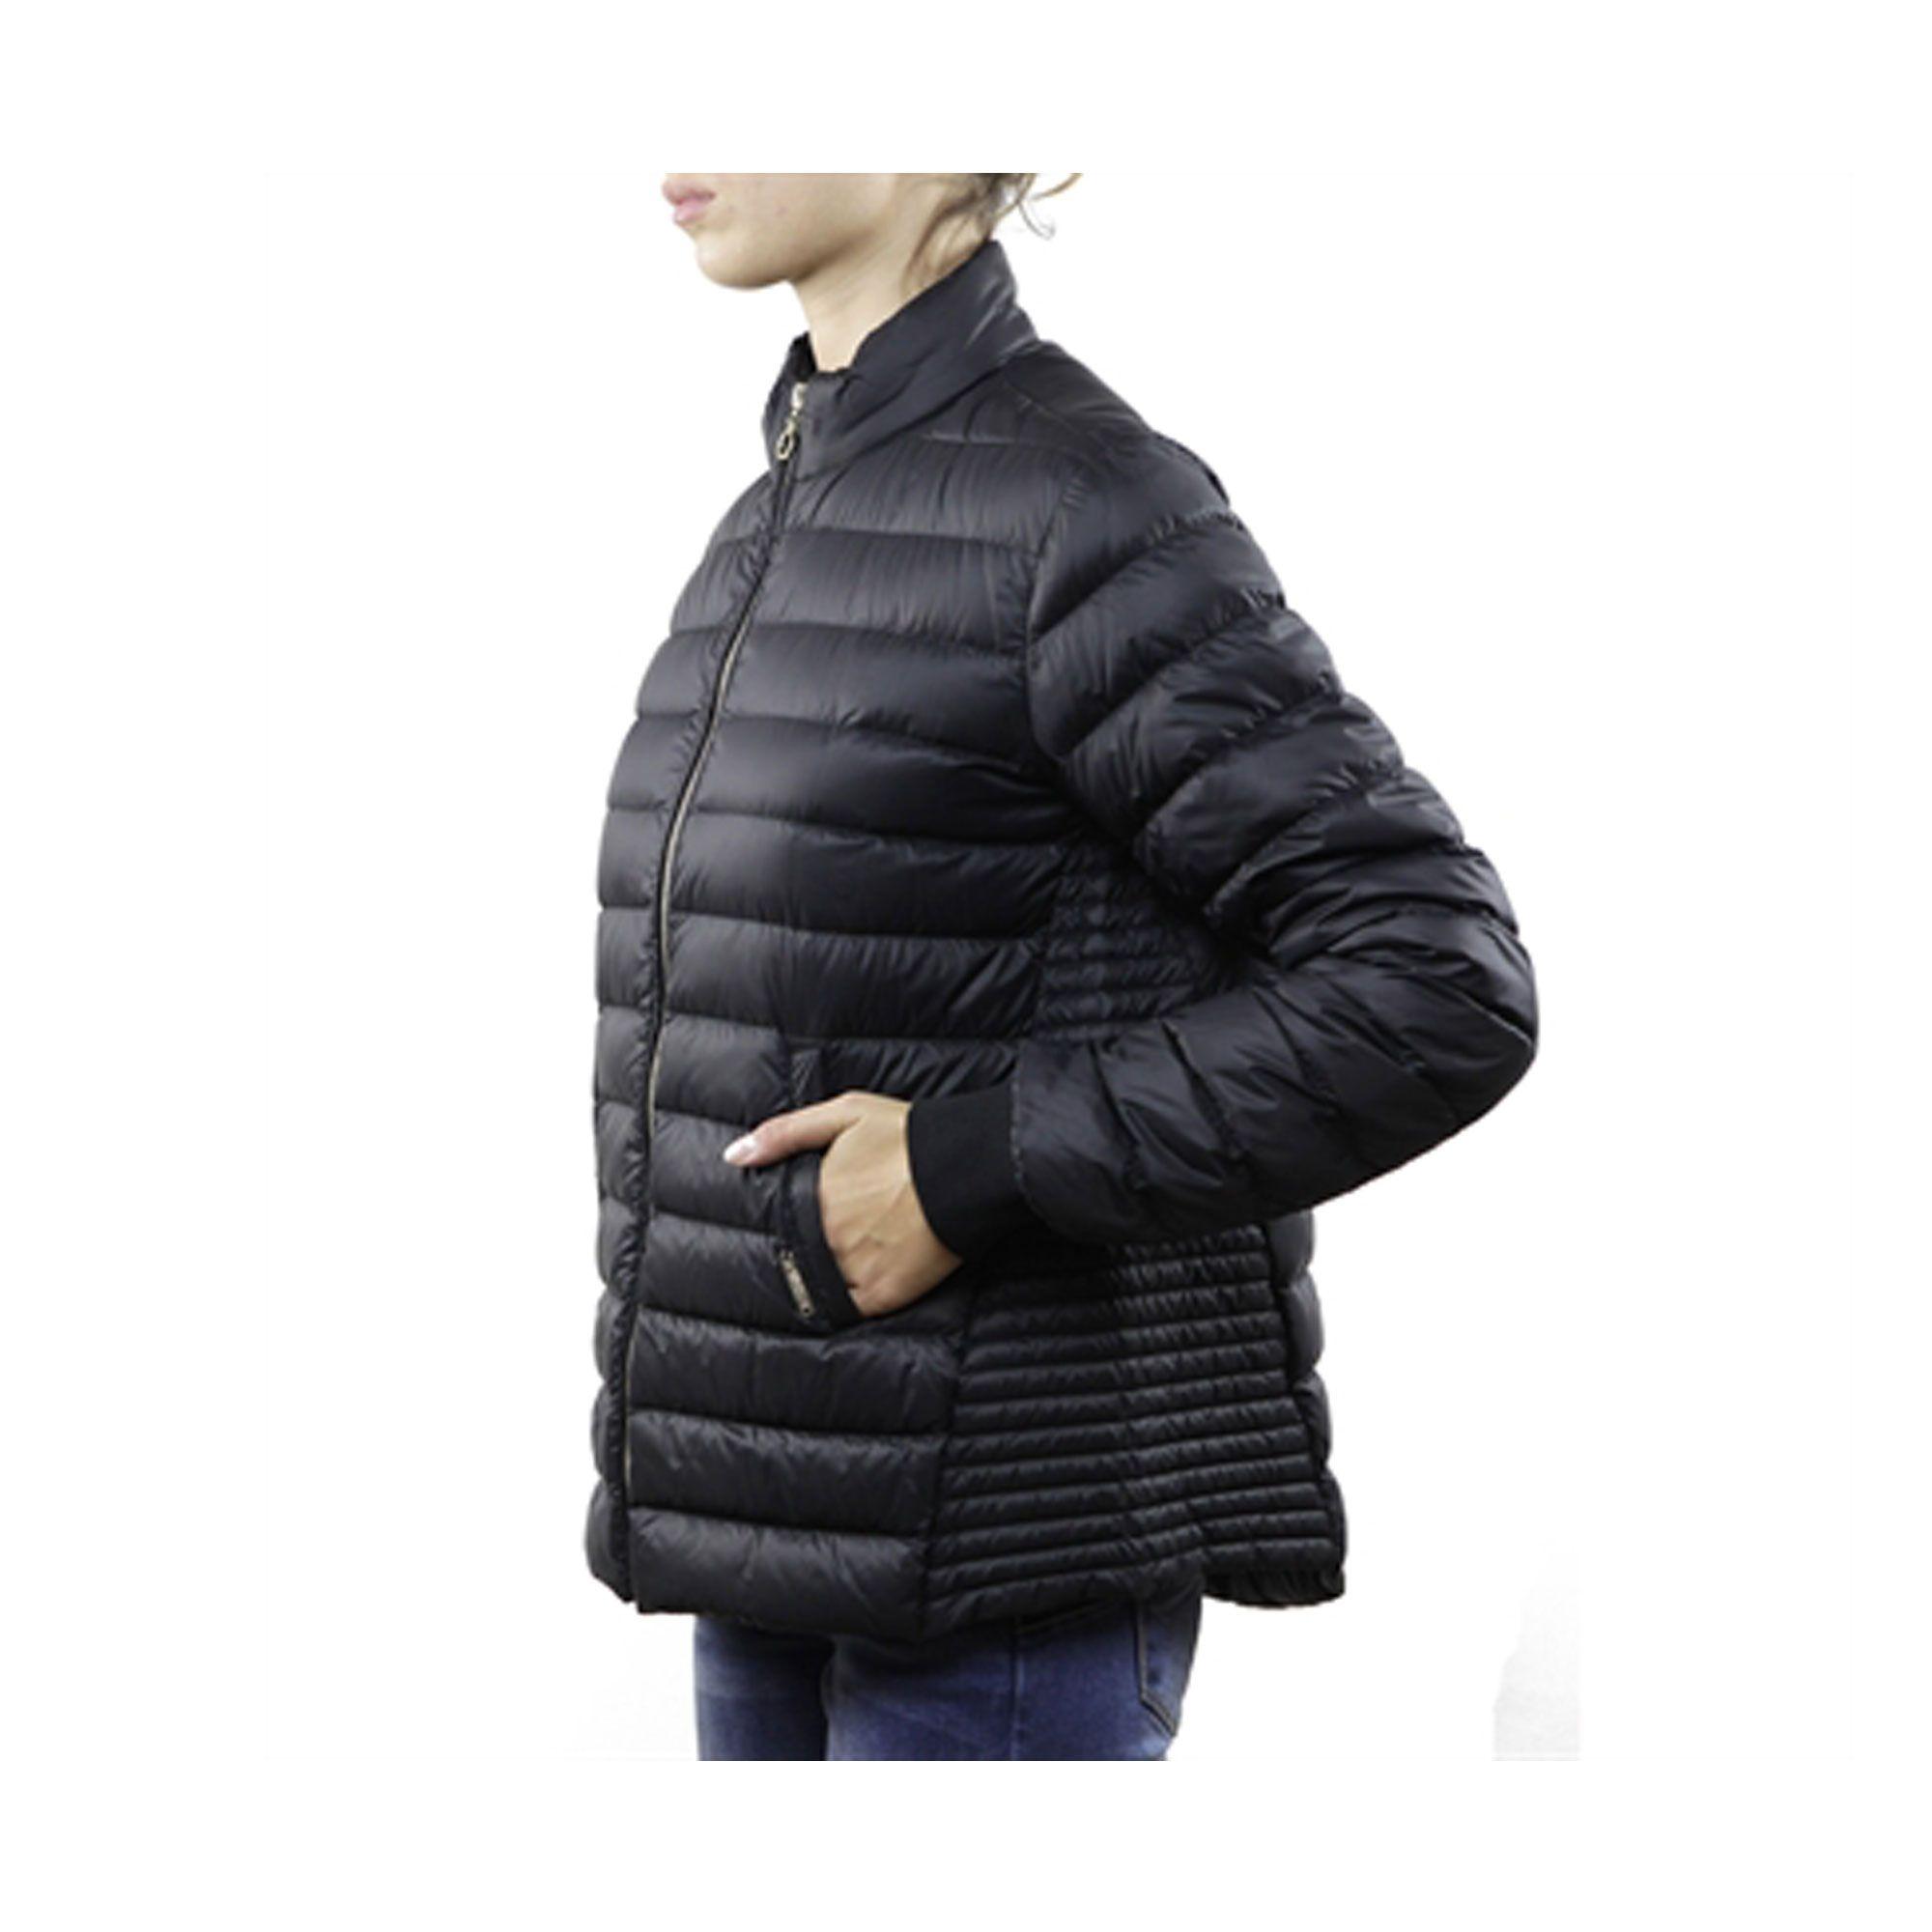 low priced 74e17 865da Matelassé doudoune Liu Jo noir Atlanta